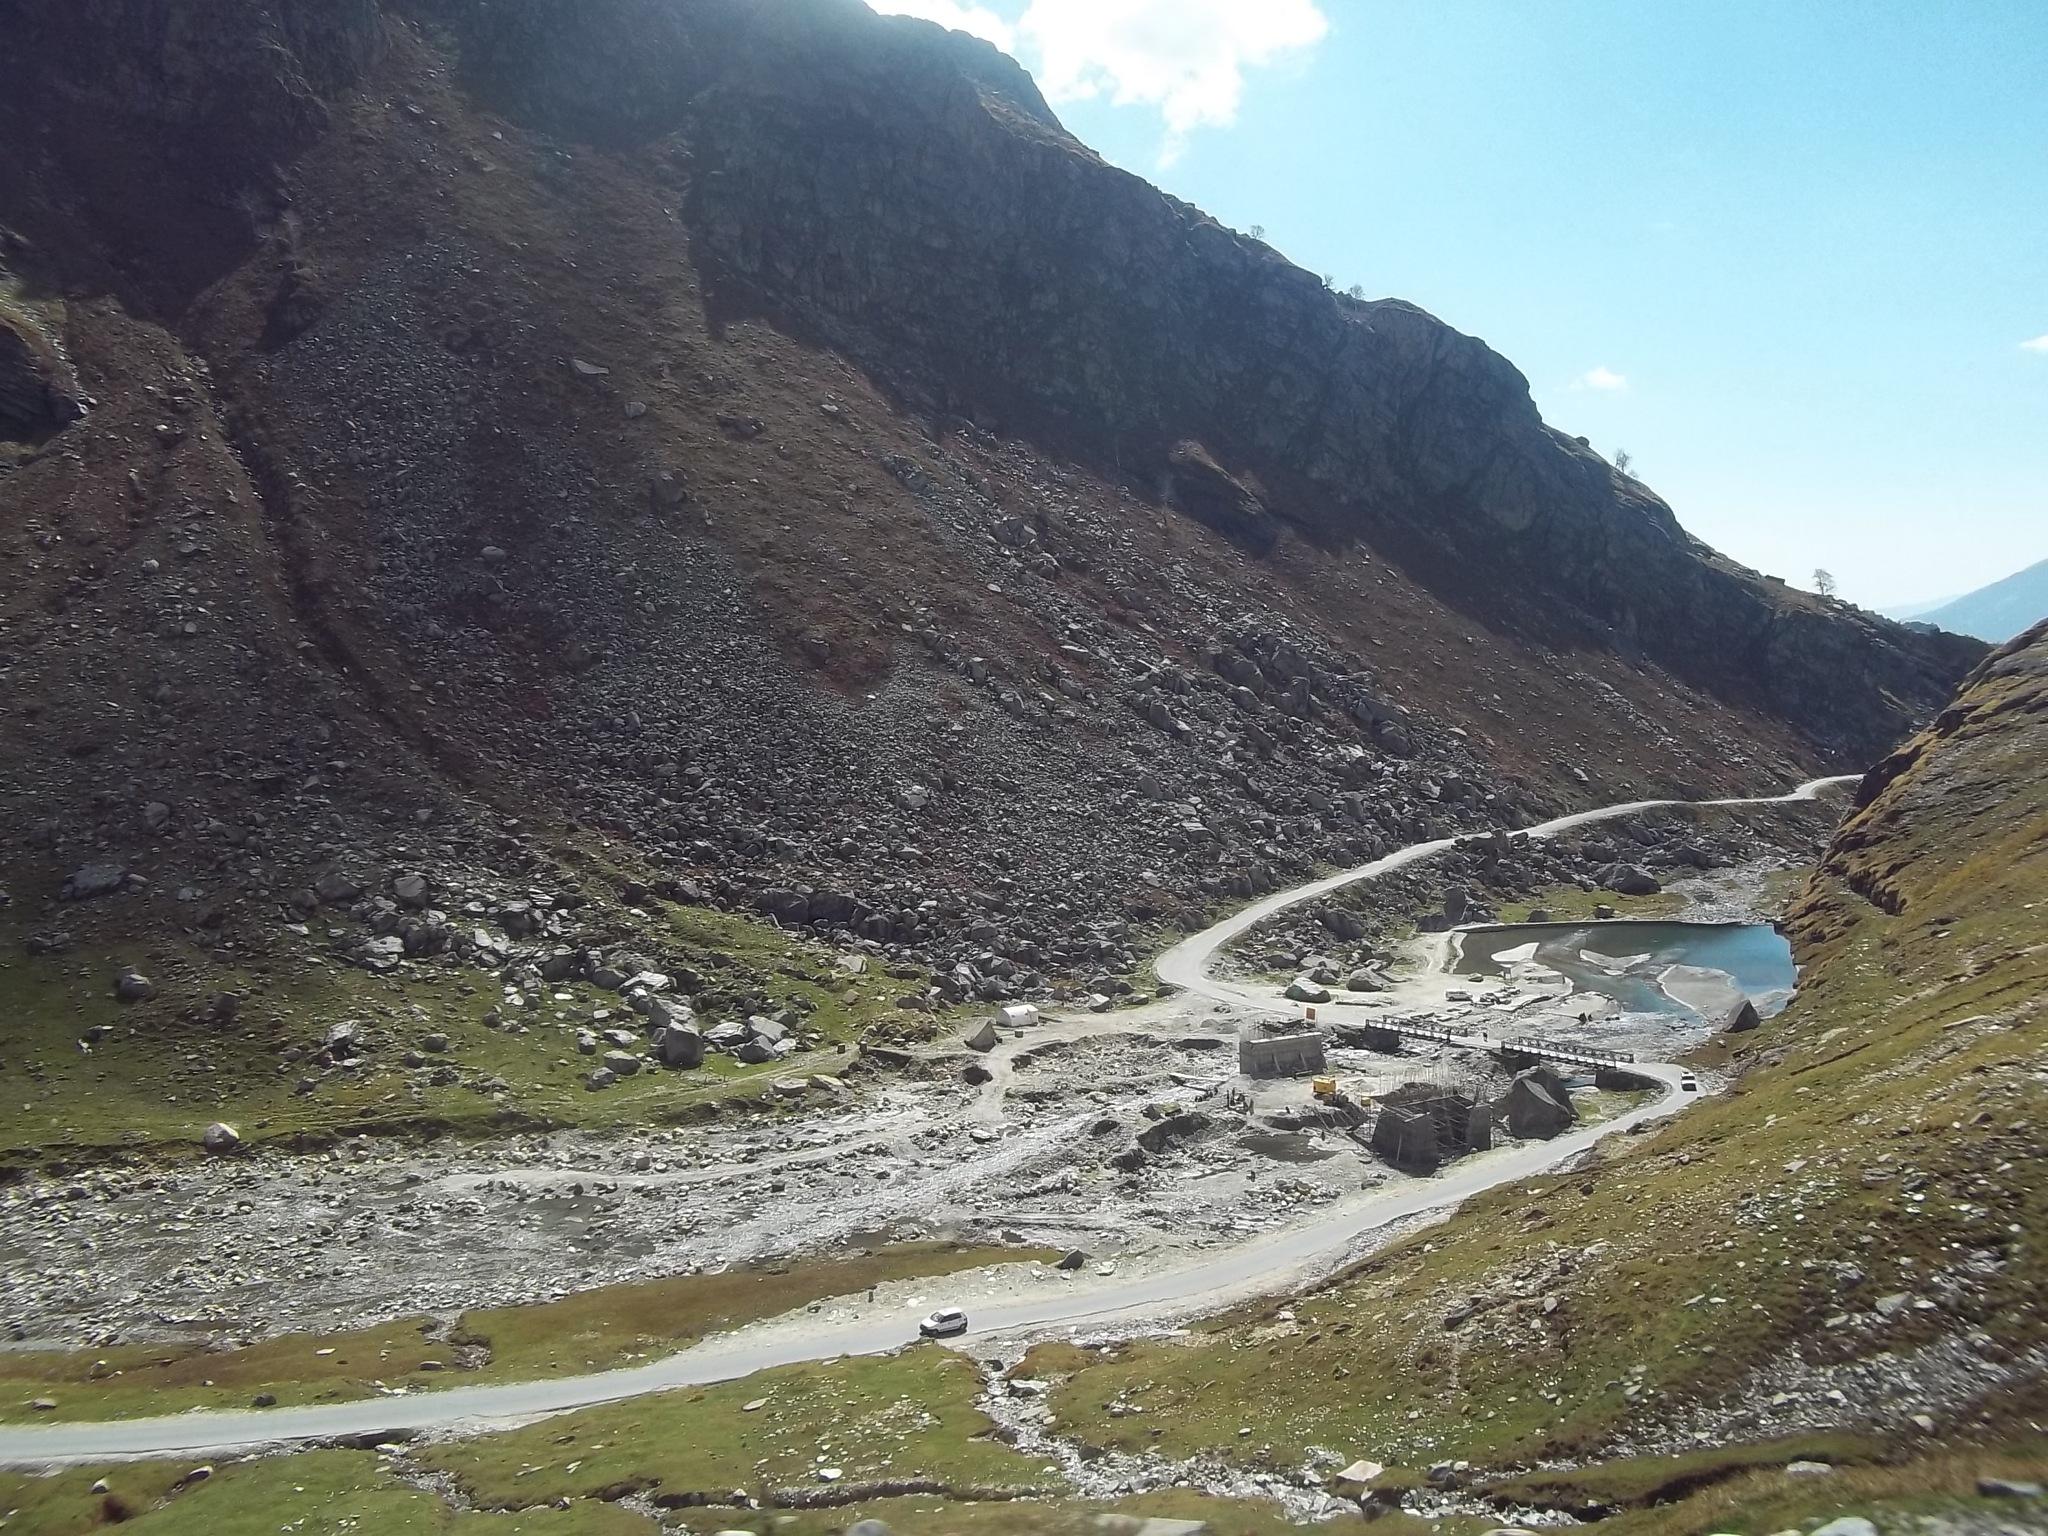 Rohtang Pass by Sumit Jhamb